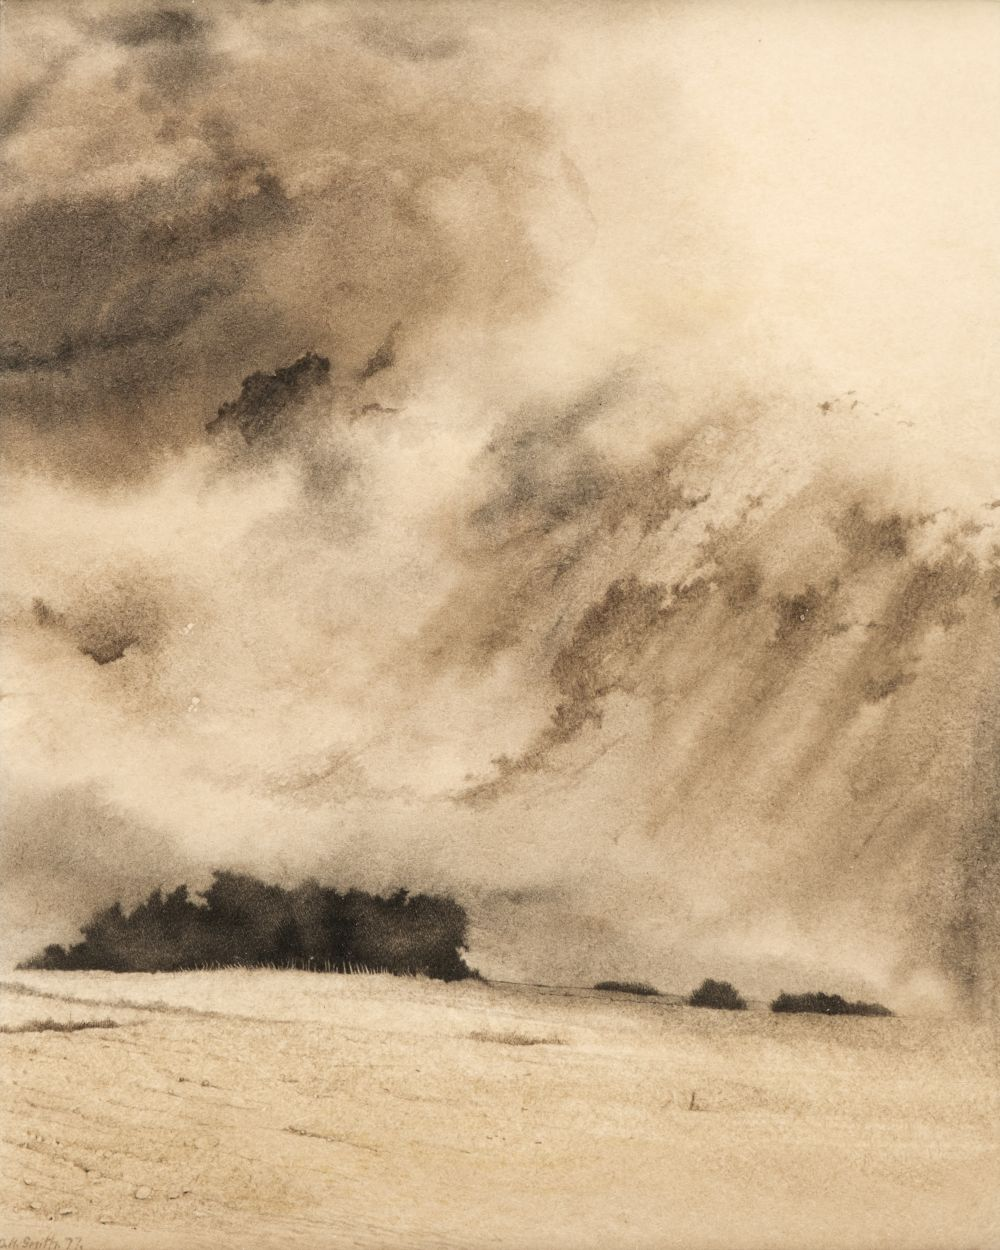 * Smith (D.H., born 1947). Storm I, 1977